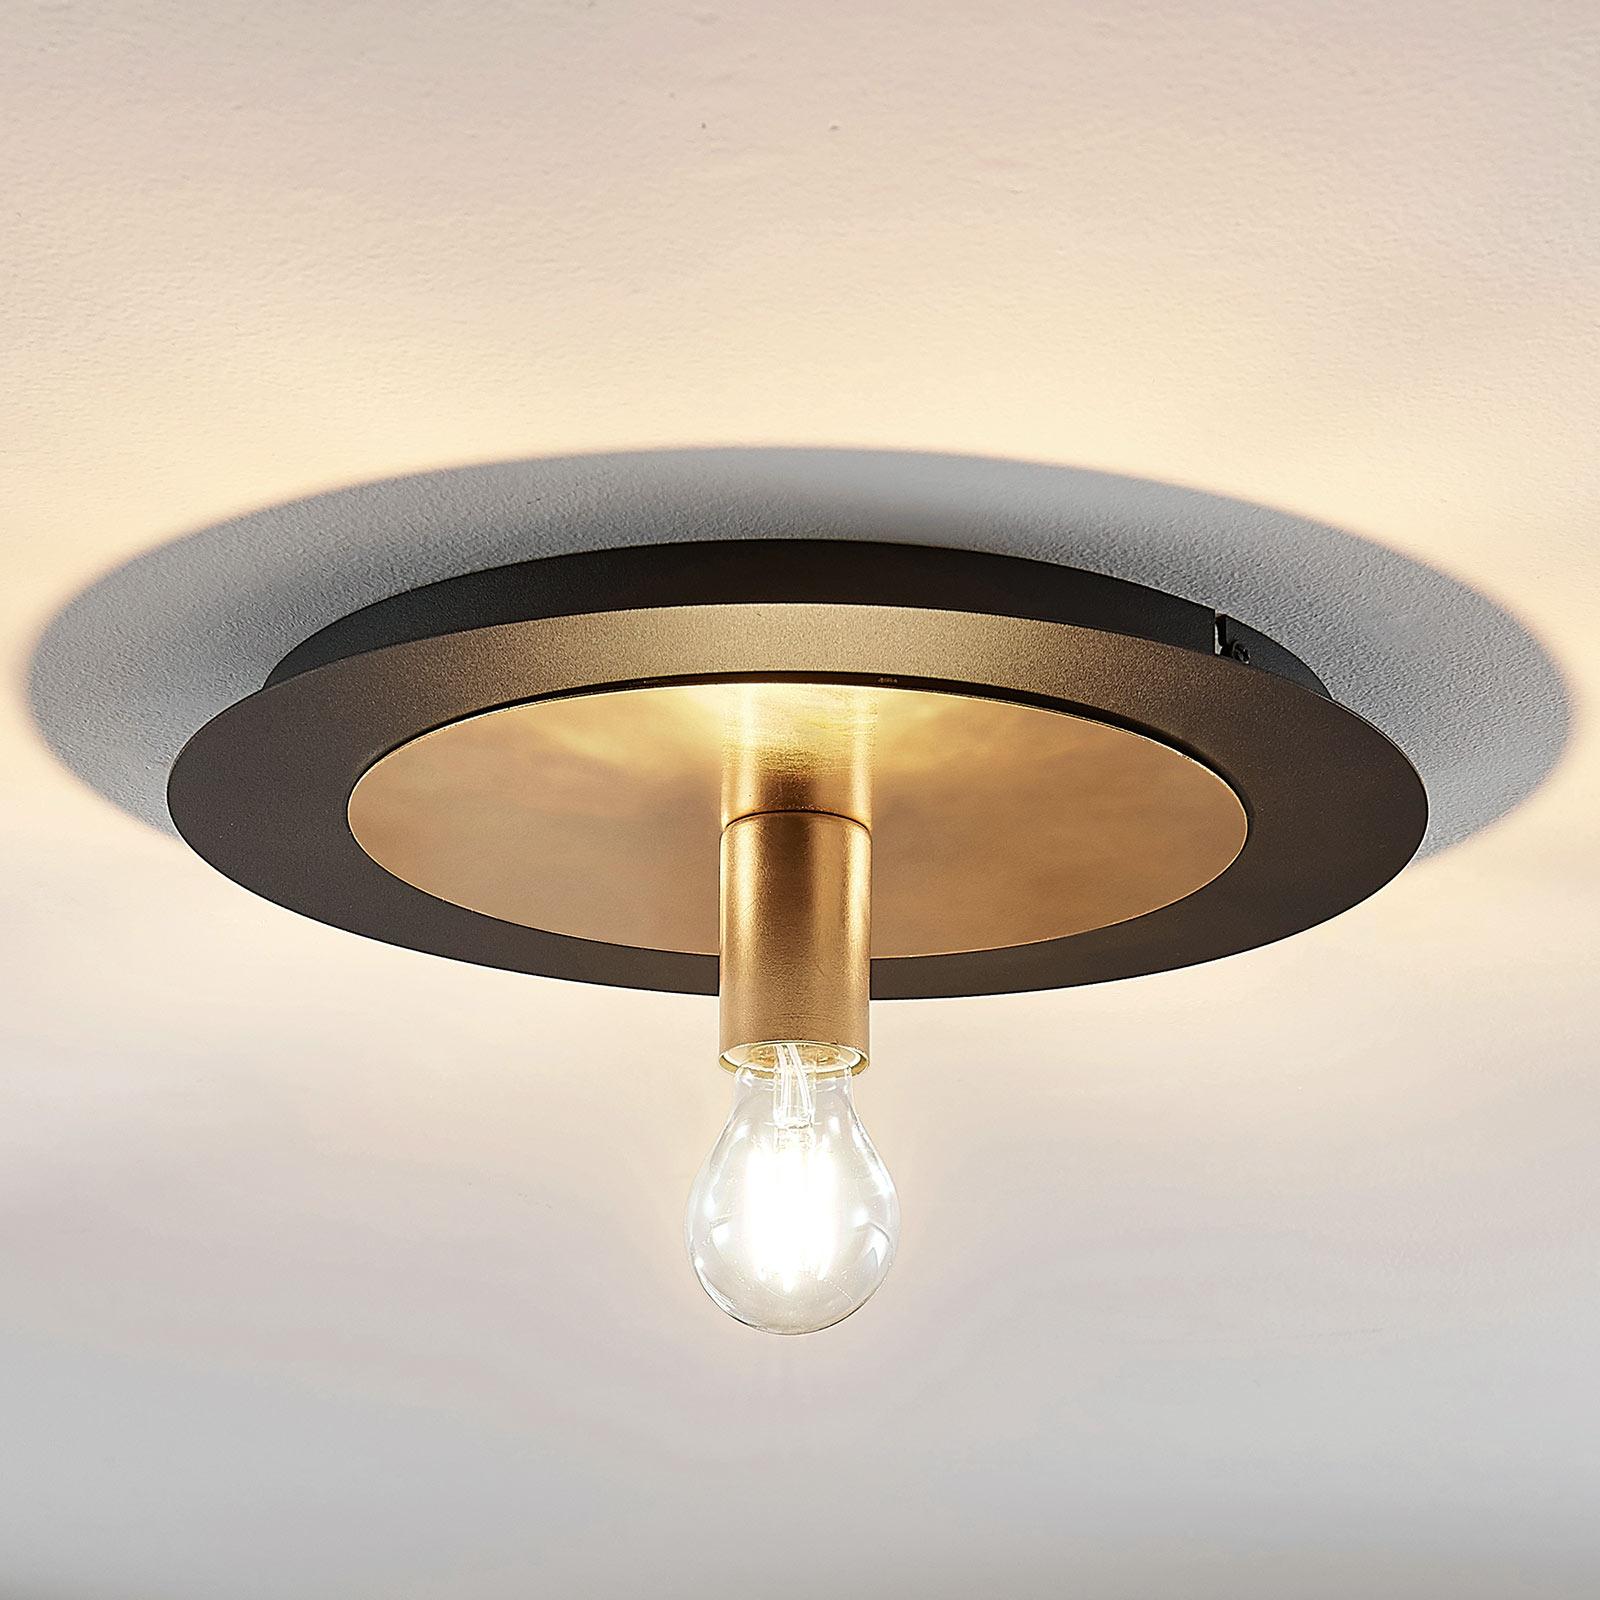 Metalen plafondlamp Justik, één lampje, zwart